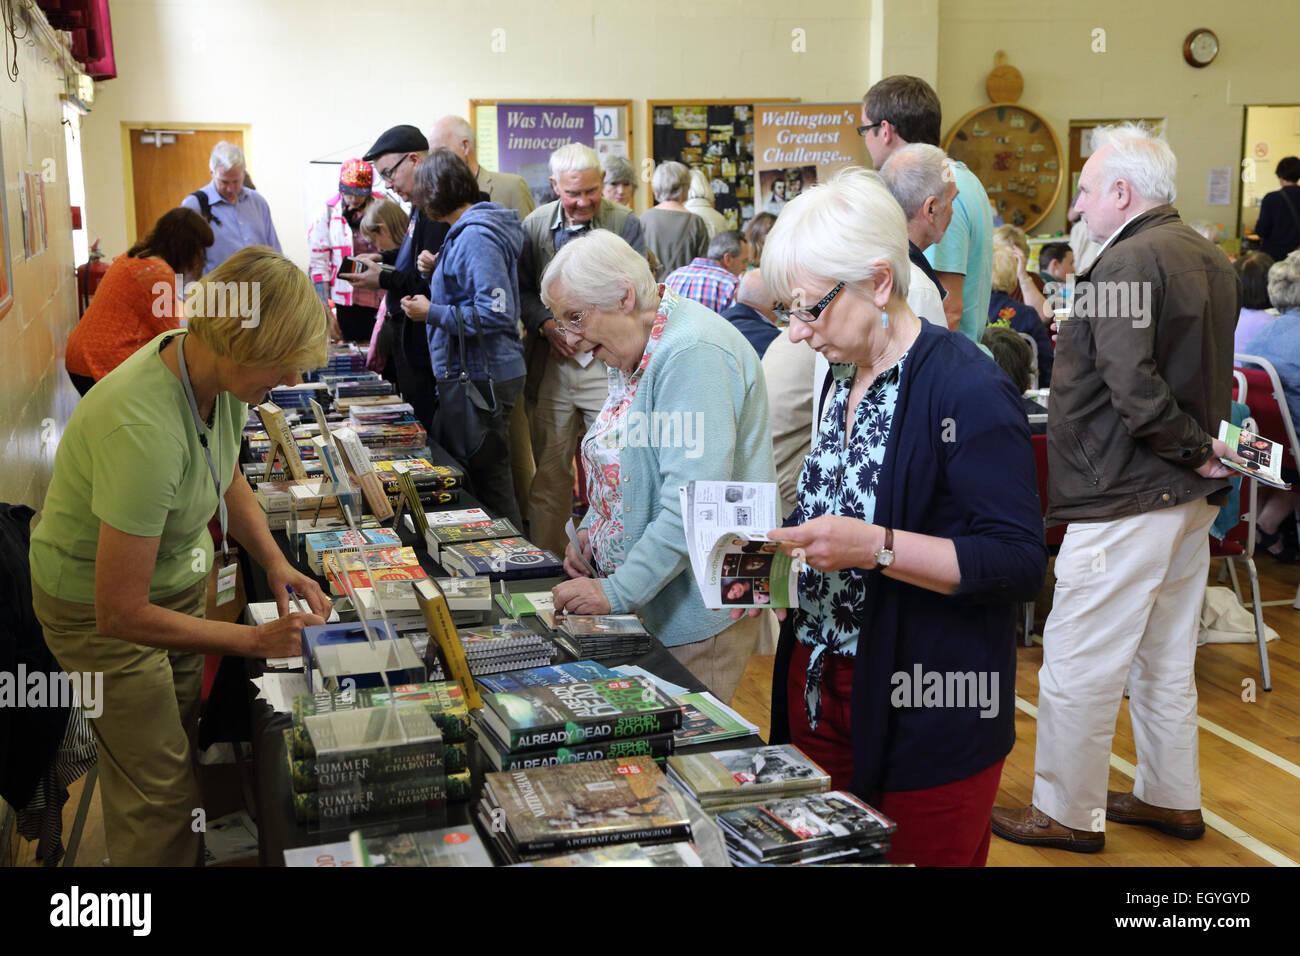 Lowdham Book Festival Notts - Stock Image